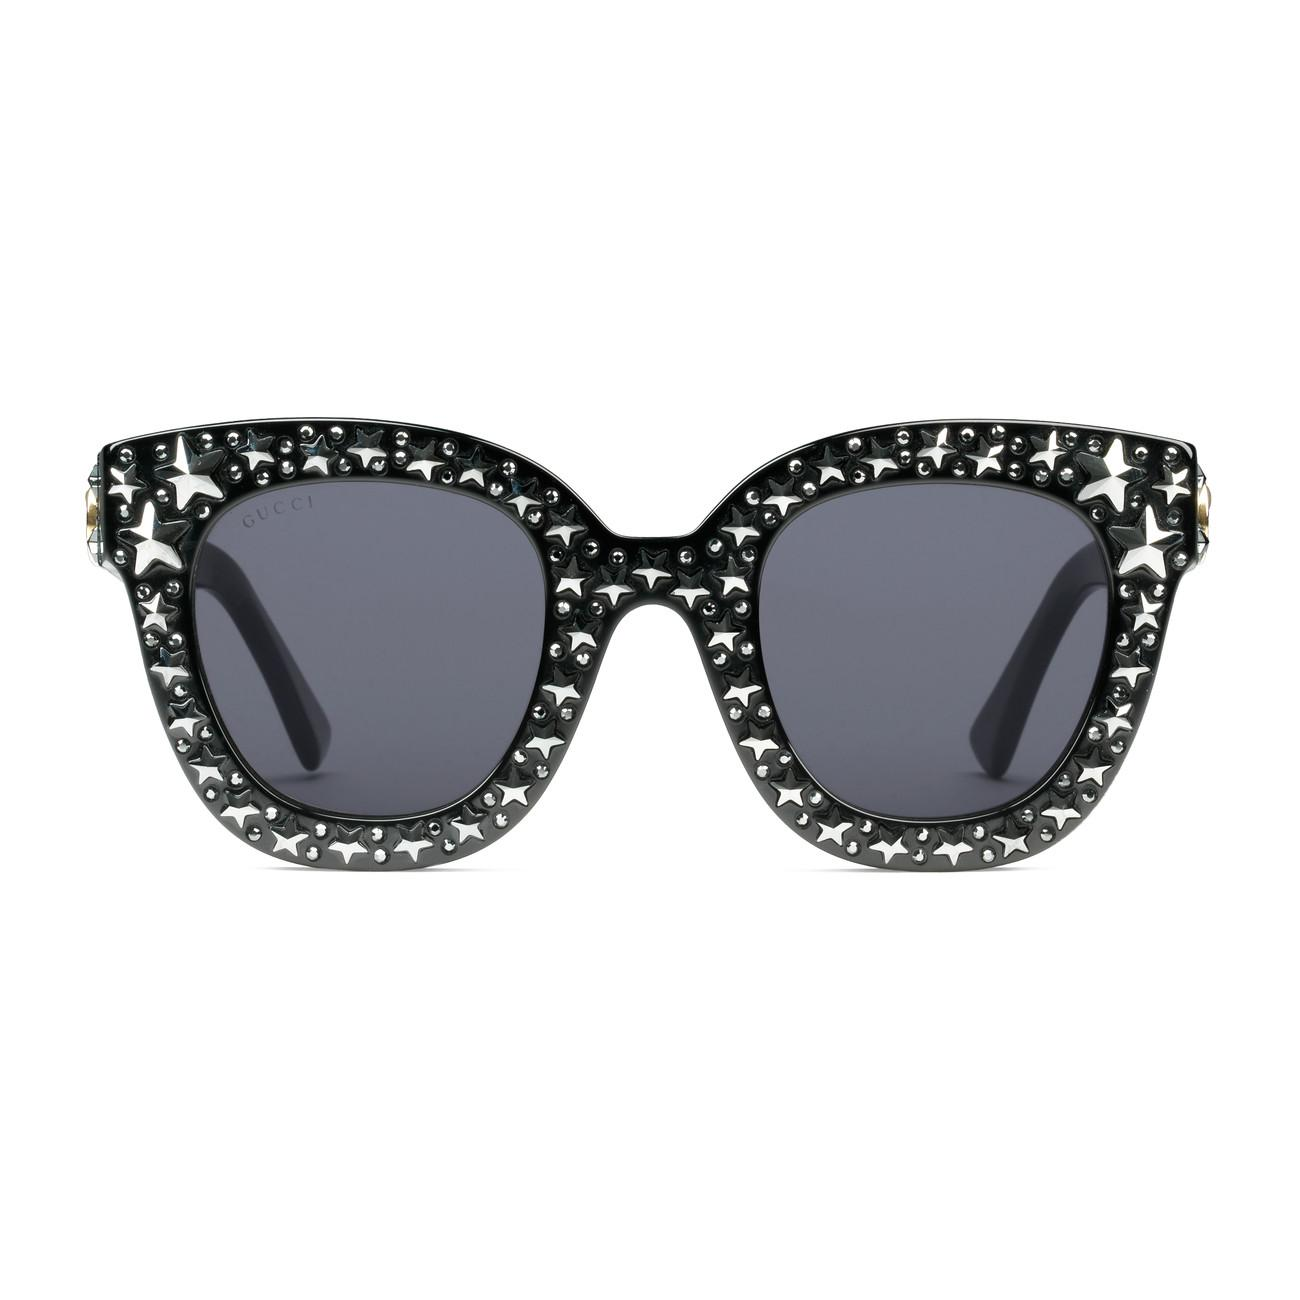 1bd9ec2d85ed8 Gucci - Black Cat Eye Acetate Sunglasses With Stars - Lyst. View fullscreen